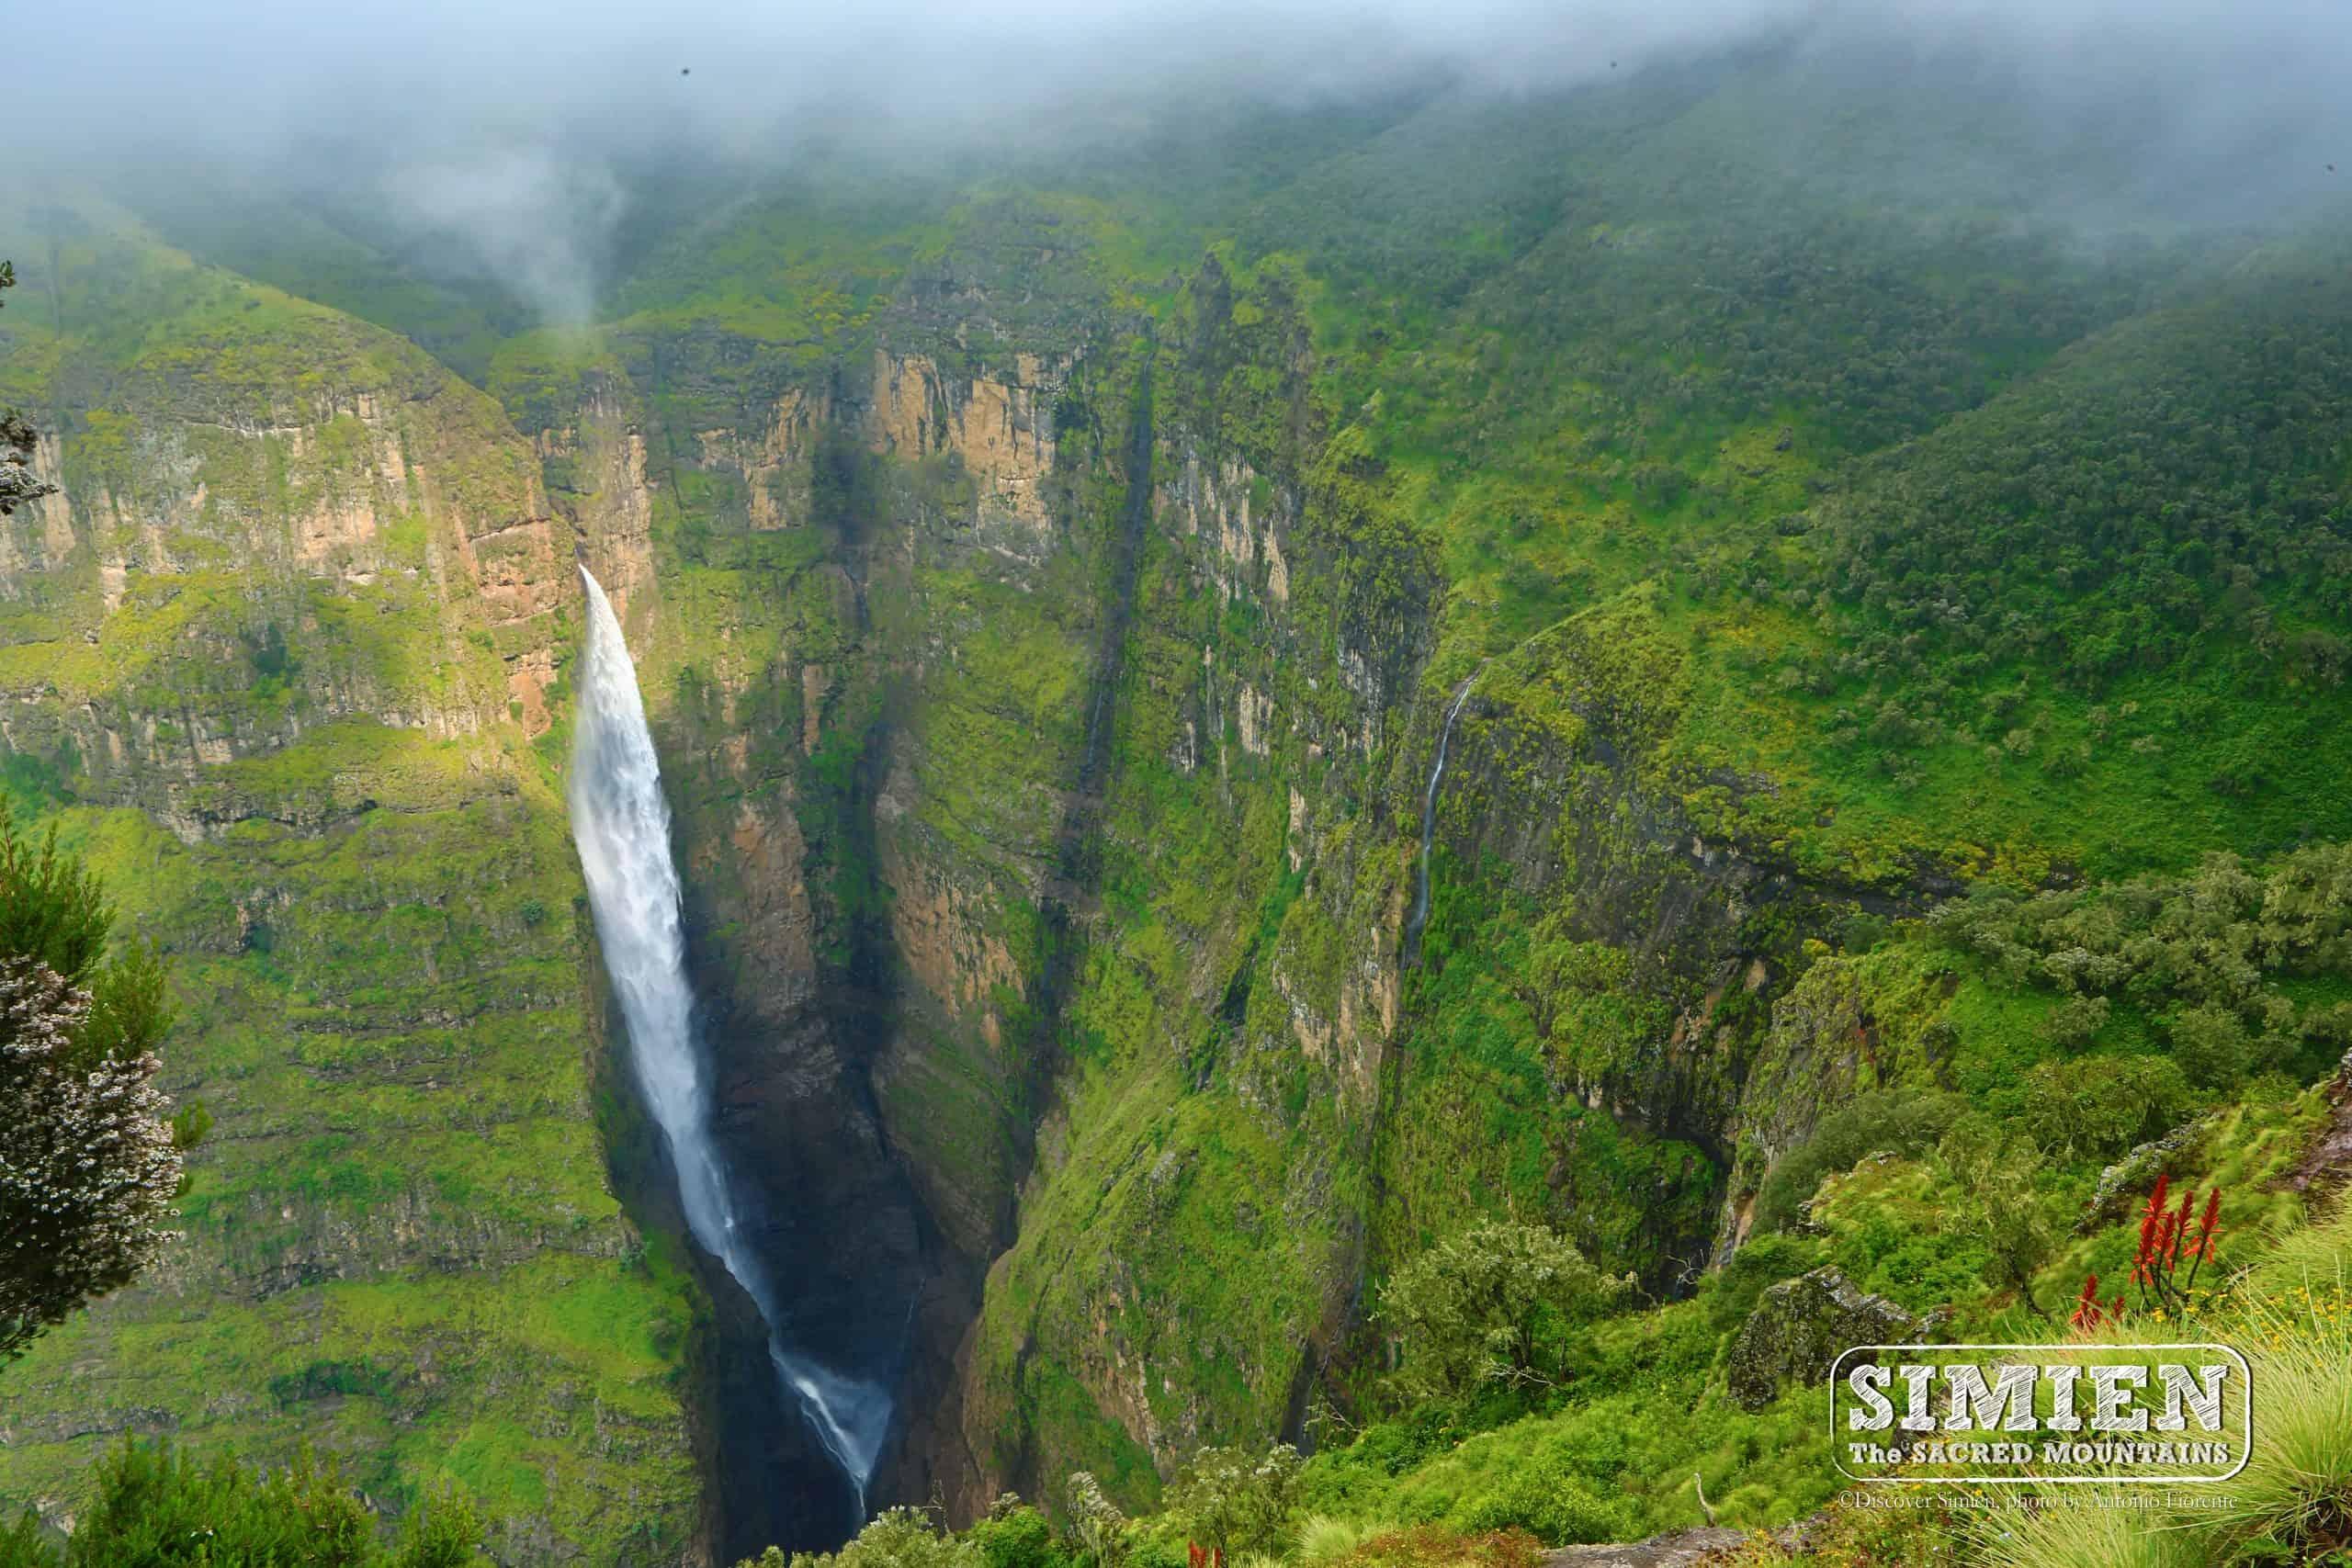 Copy Of Simien Mountains Lnadscape